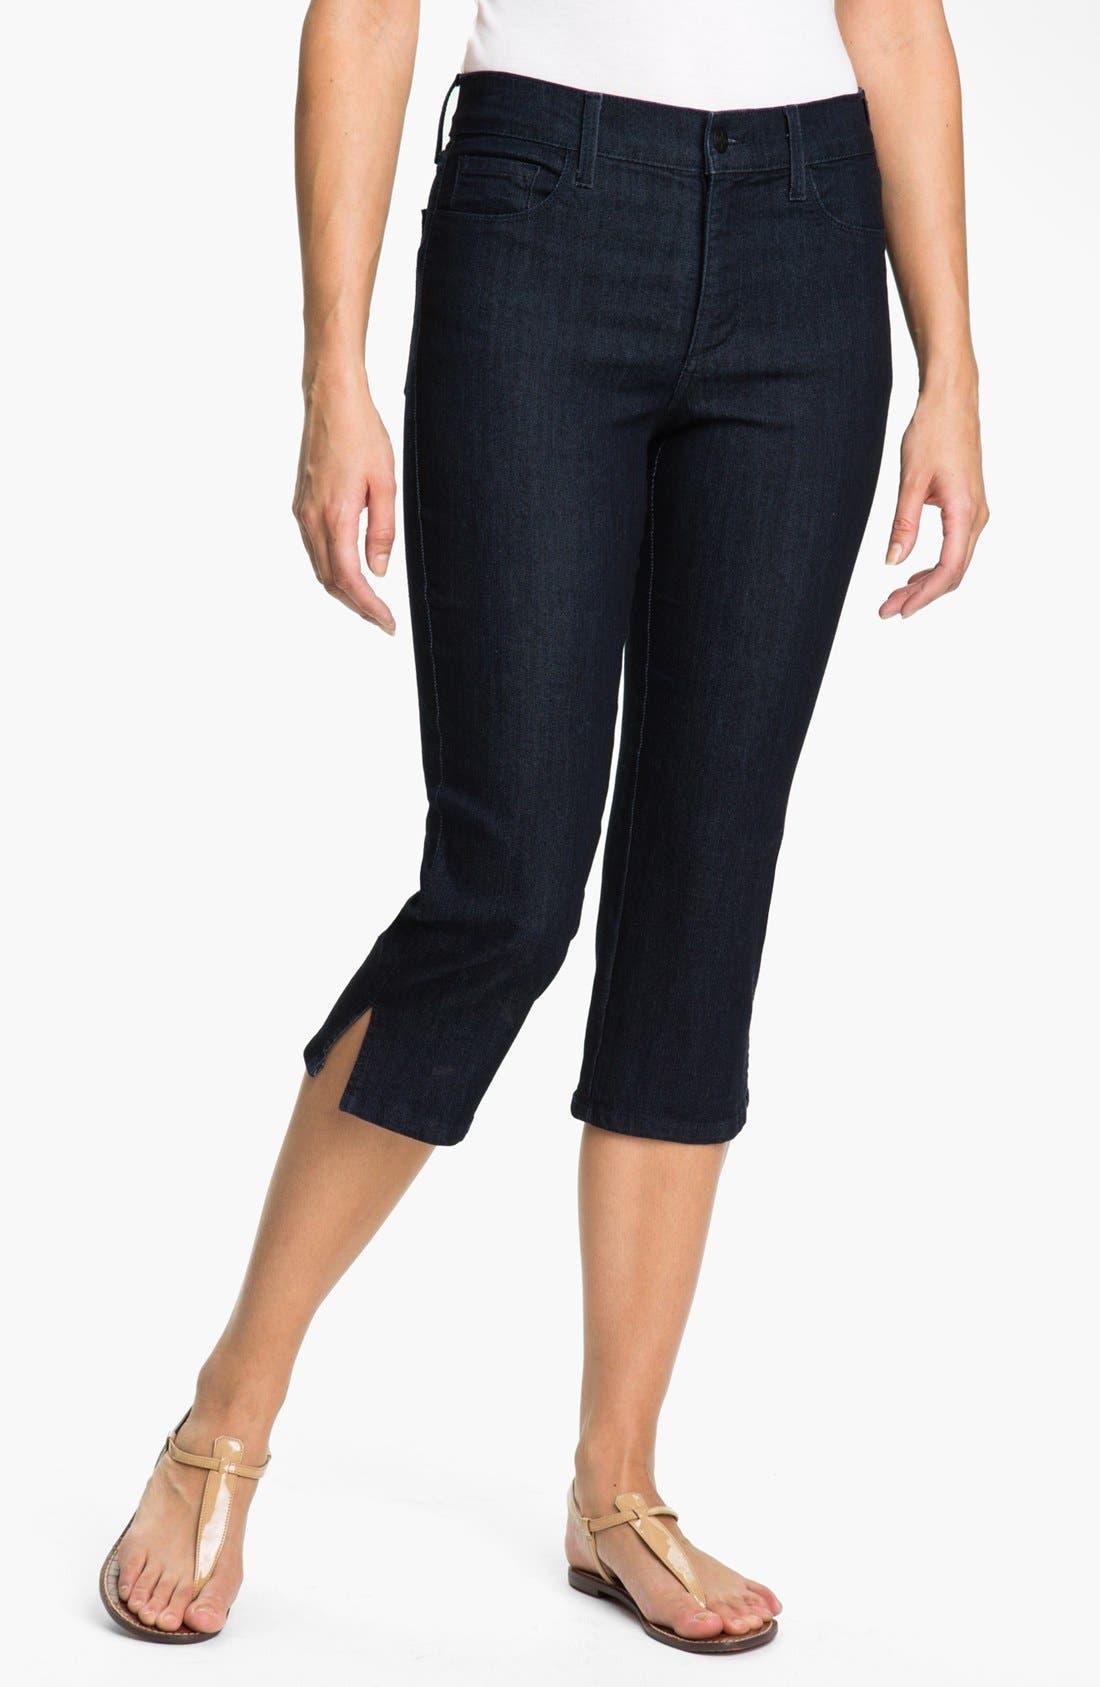 Alternate Image 1 Selected - NYDJ 'Nanette' Stretch Crop Jeans (Dark Enzyme) (Petite)